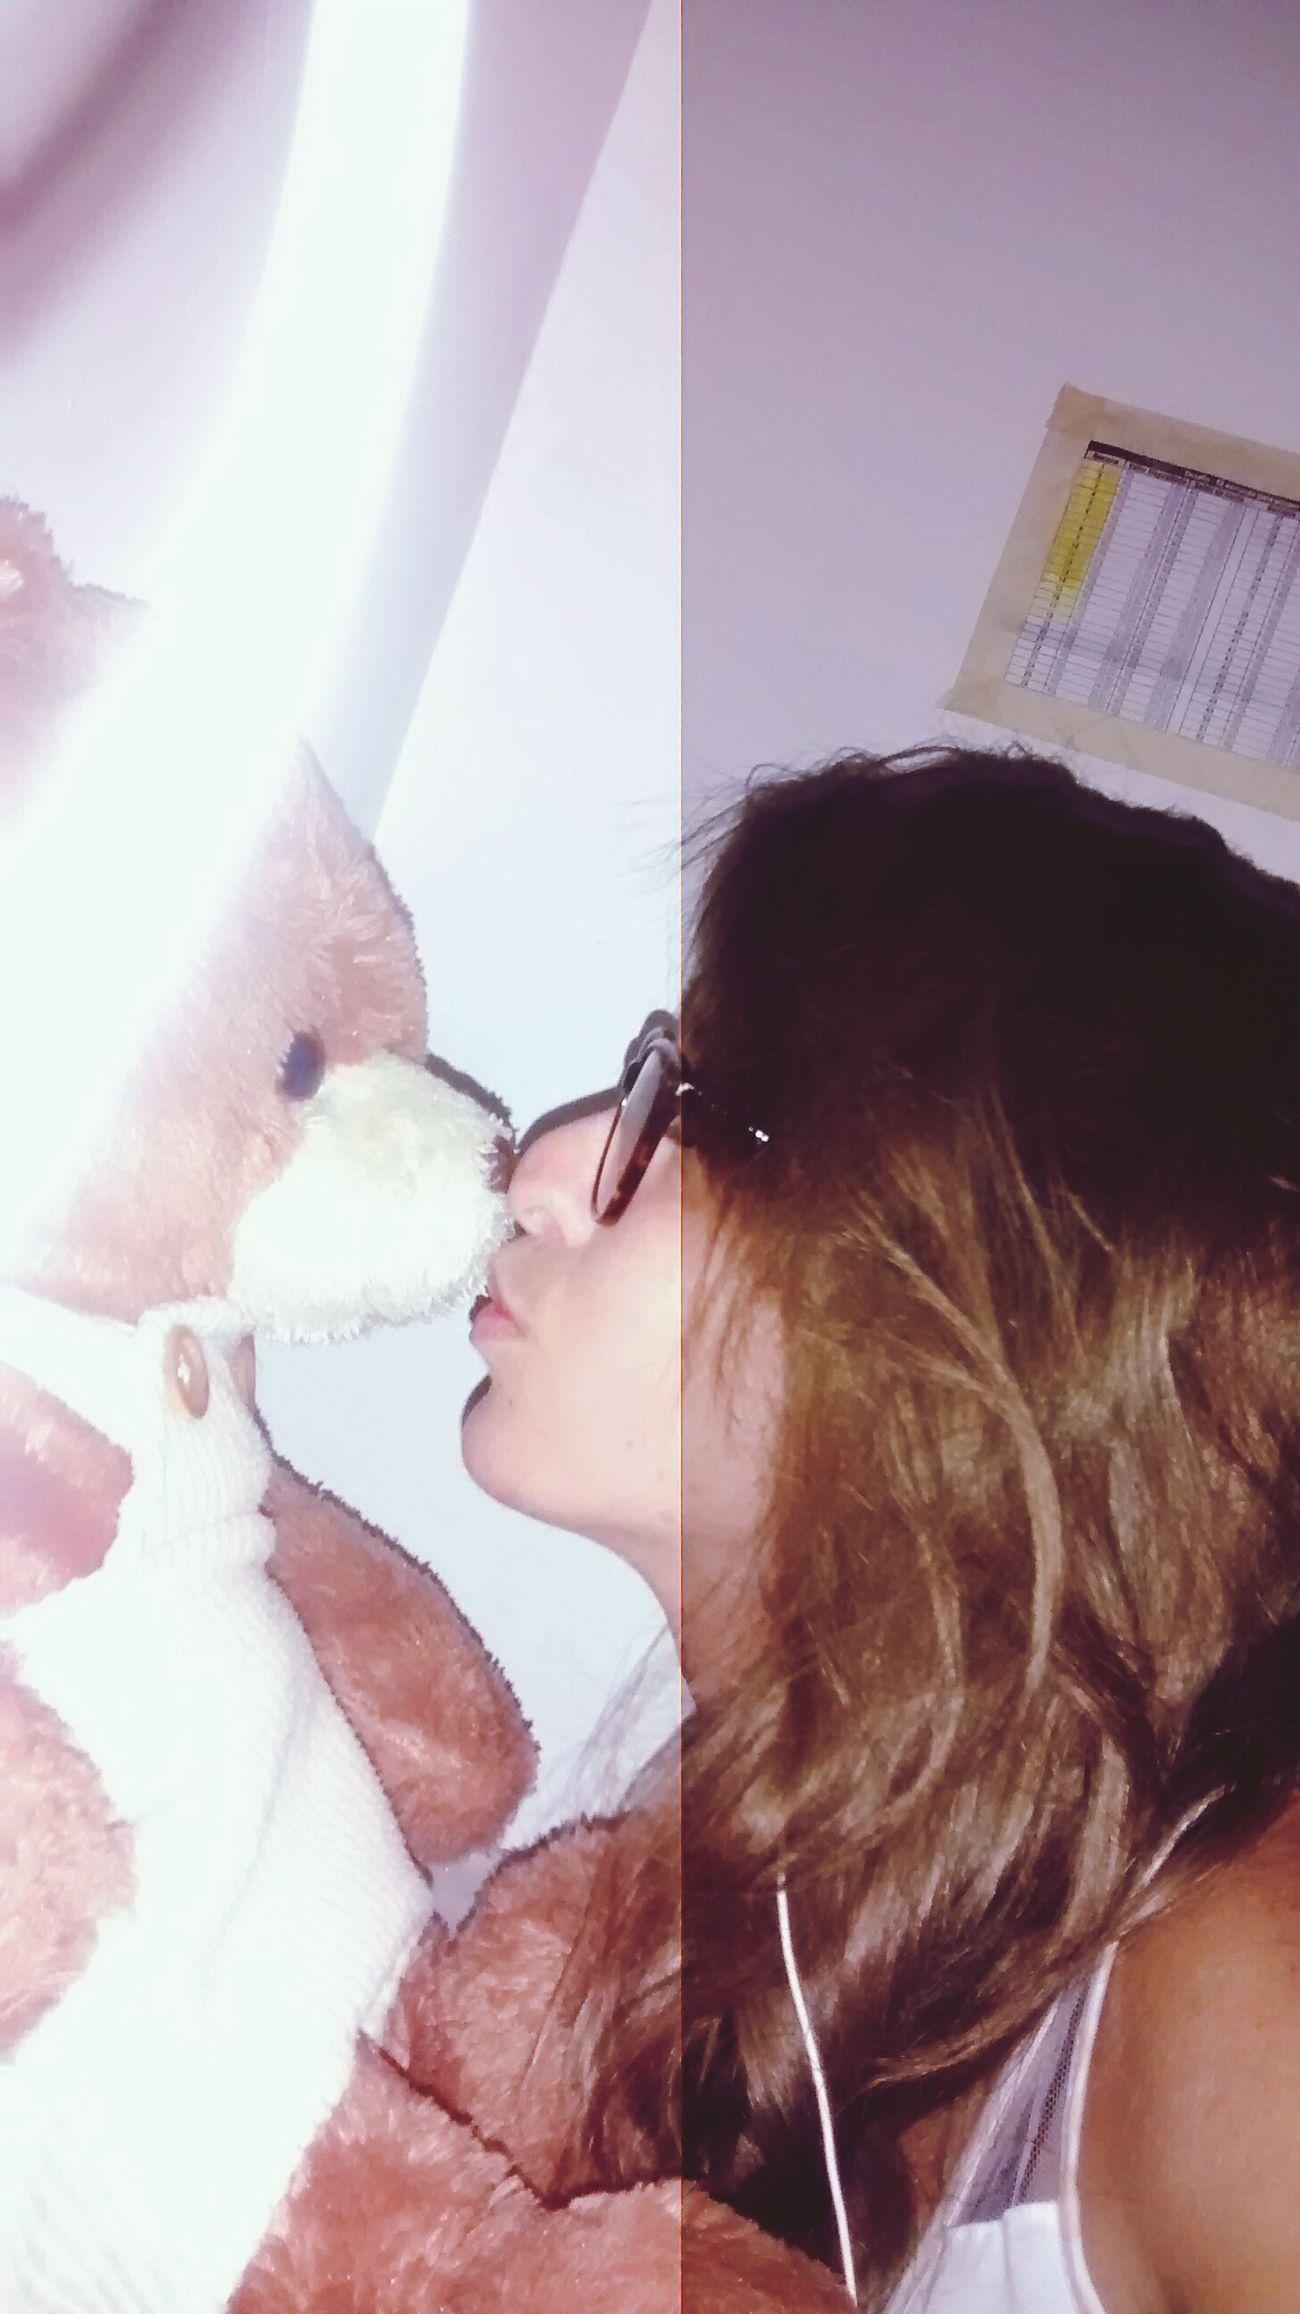 Meuamor 😊❤ Pictureoftheday Lindos Beijooooo :3 Kisses